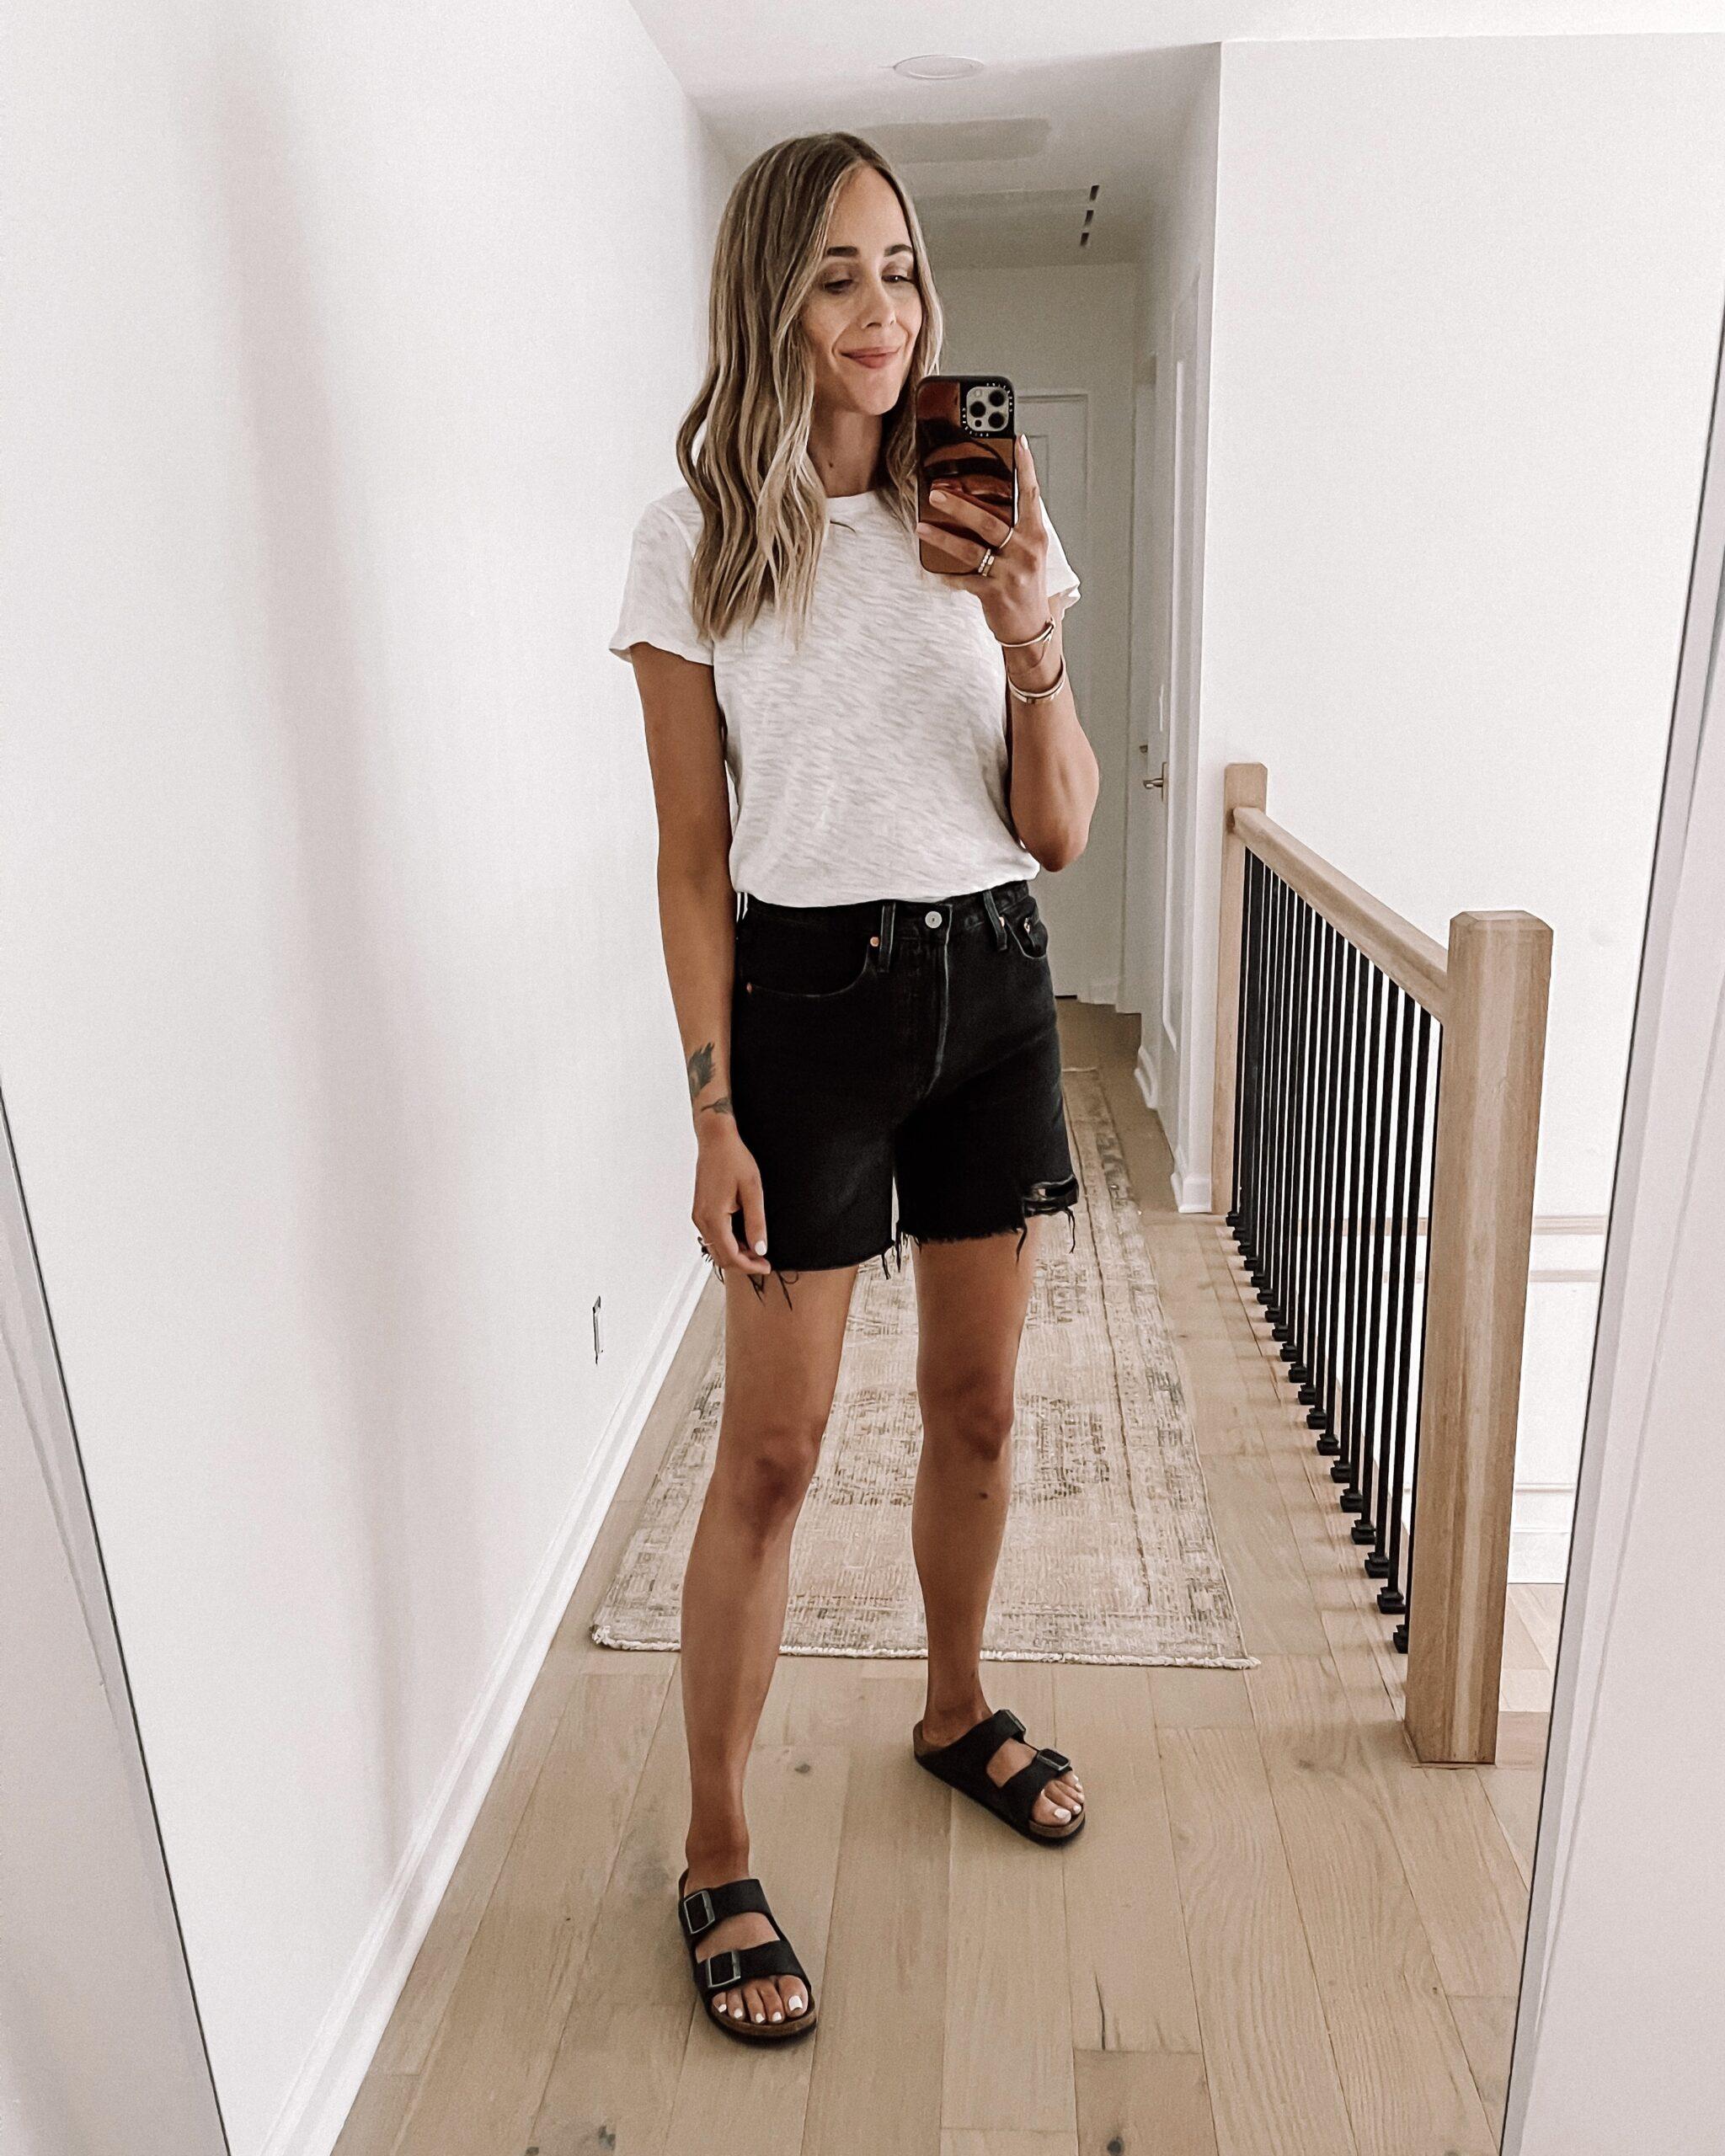 Fashion Jackson Wearing ATM White Tshirt Levis 501 Mid Thigh Black Denim Shorts Black Birkenstock Sandals Shopbop Haul